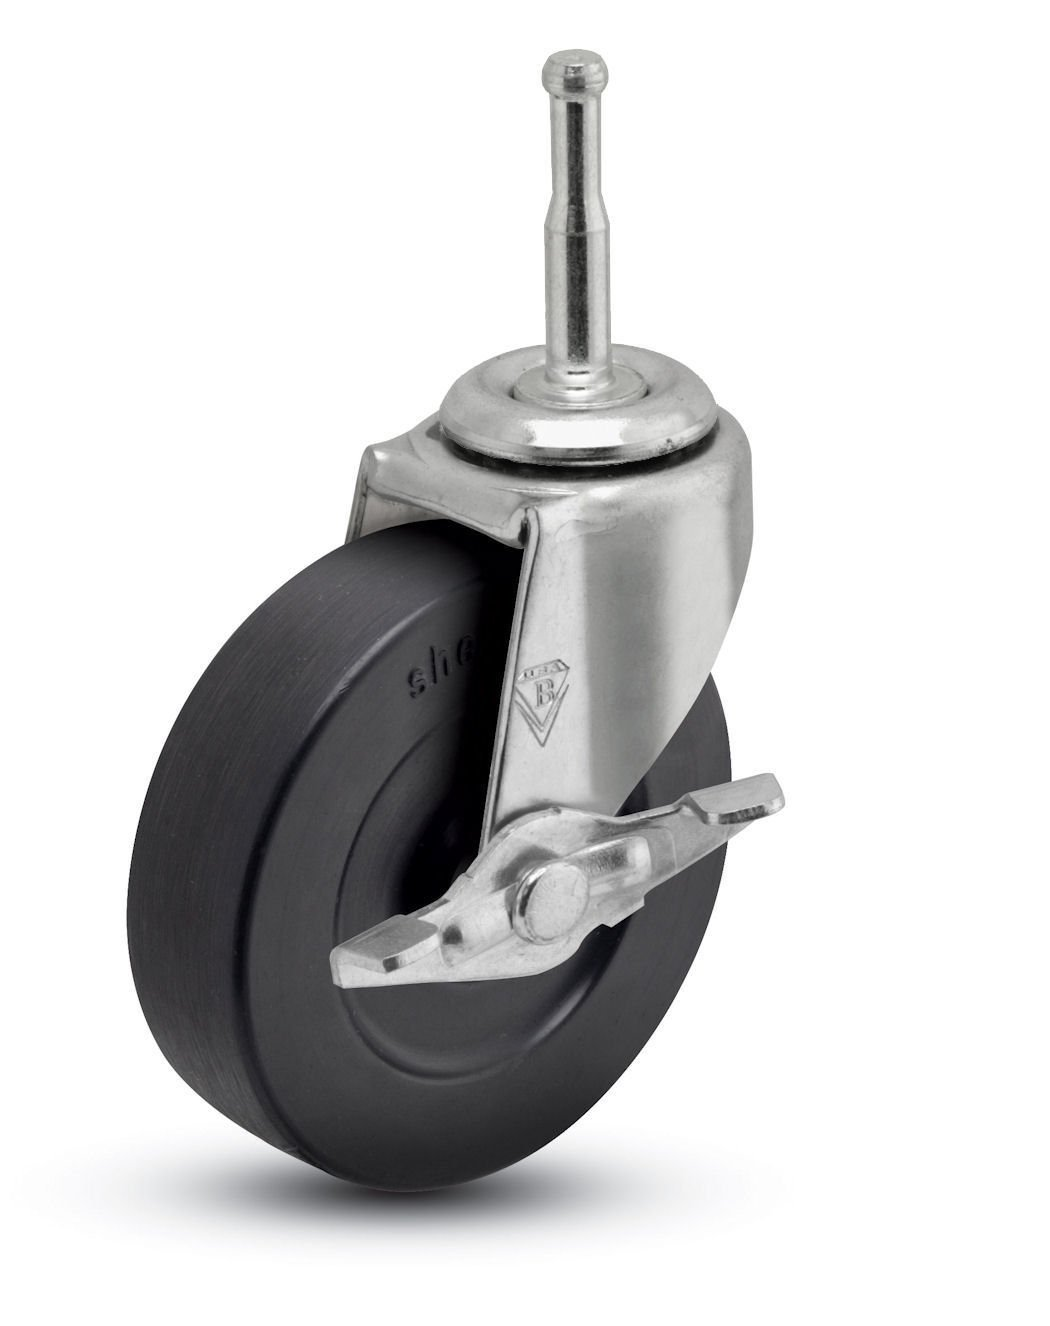 Shepherd Regent Series 2'' Diameter Soft Rubber Wheel Swivel Caster with Side Brake, 5/16'' Diameter x 1-1/2'' Length Grip Neck Stem, 80 lbs Capacity, Zinc Finish